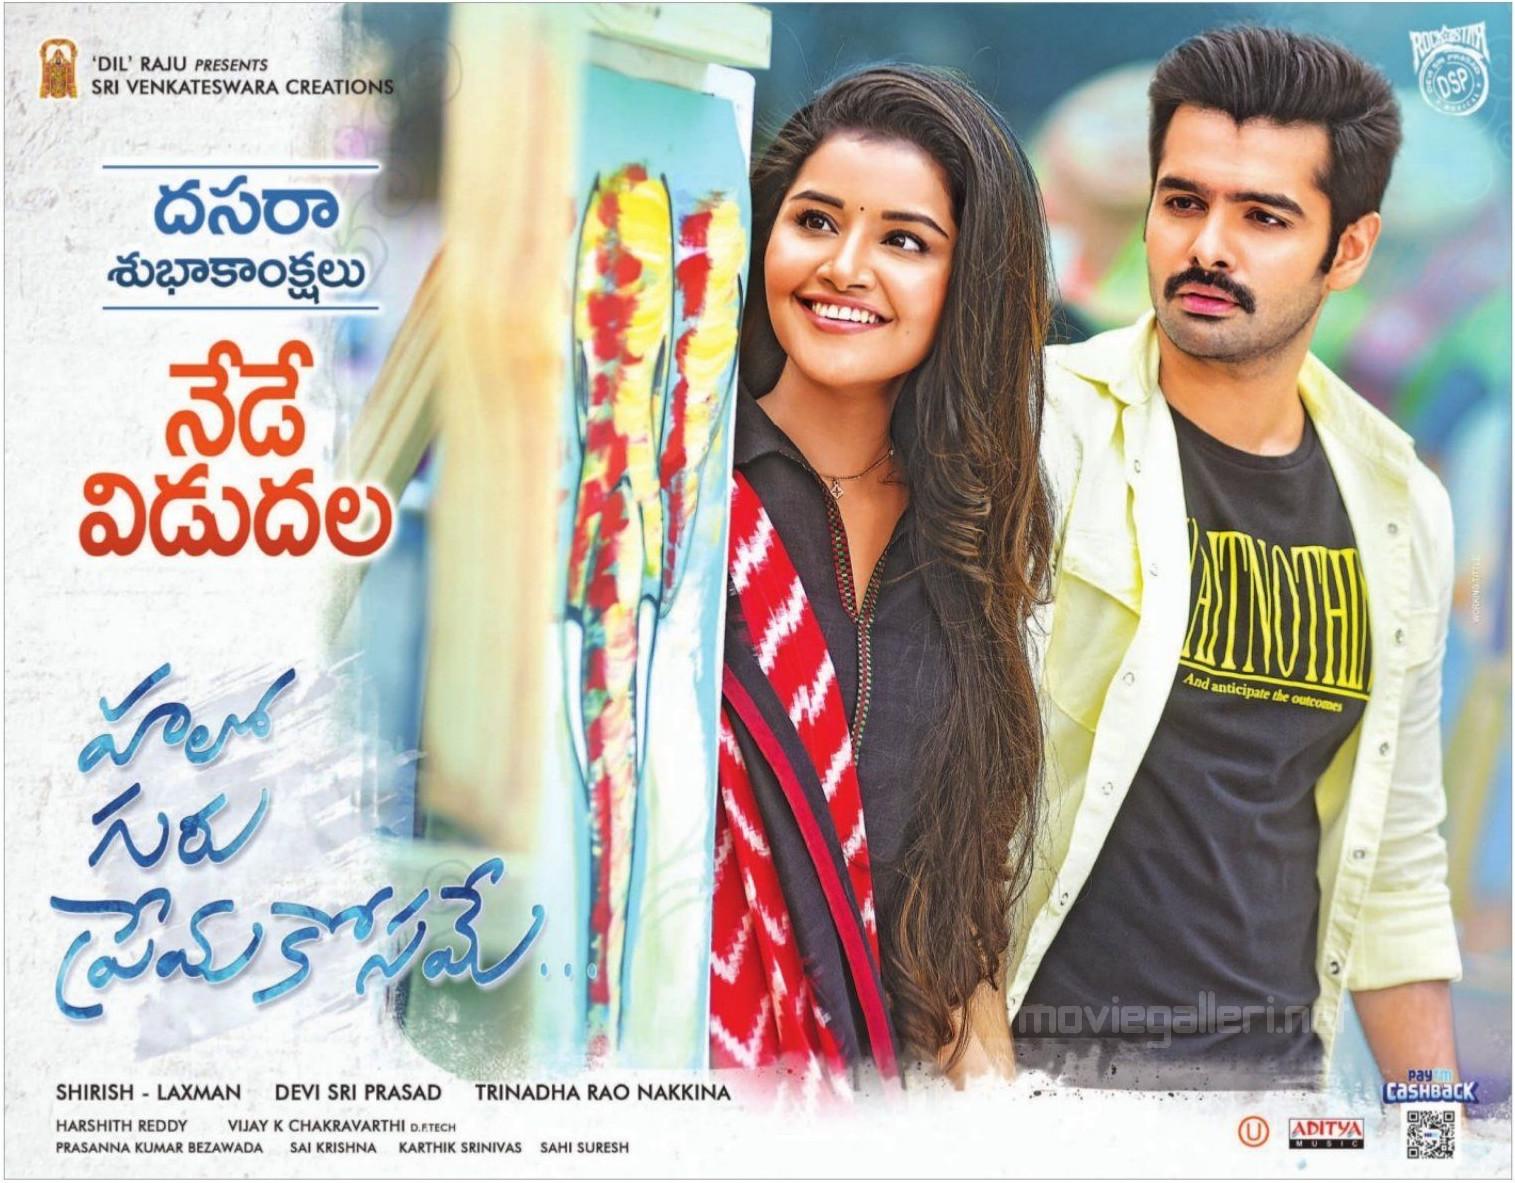 Anupama Parameswaran Ram Pothineni Hello Guru Prema Kosame Movie Release Today Posters